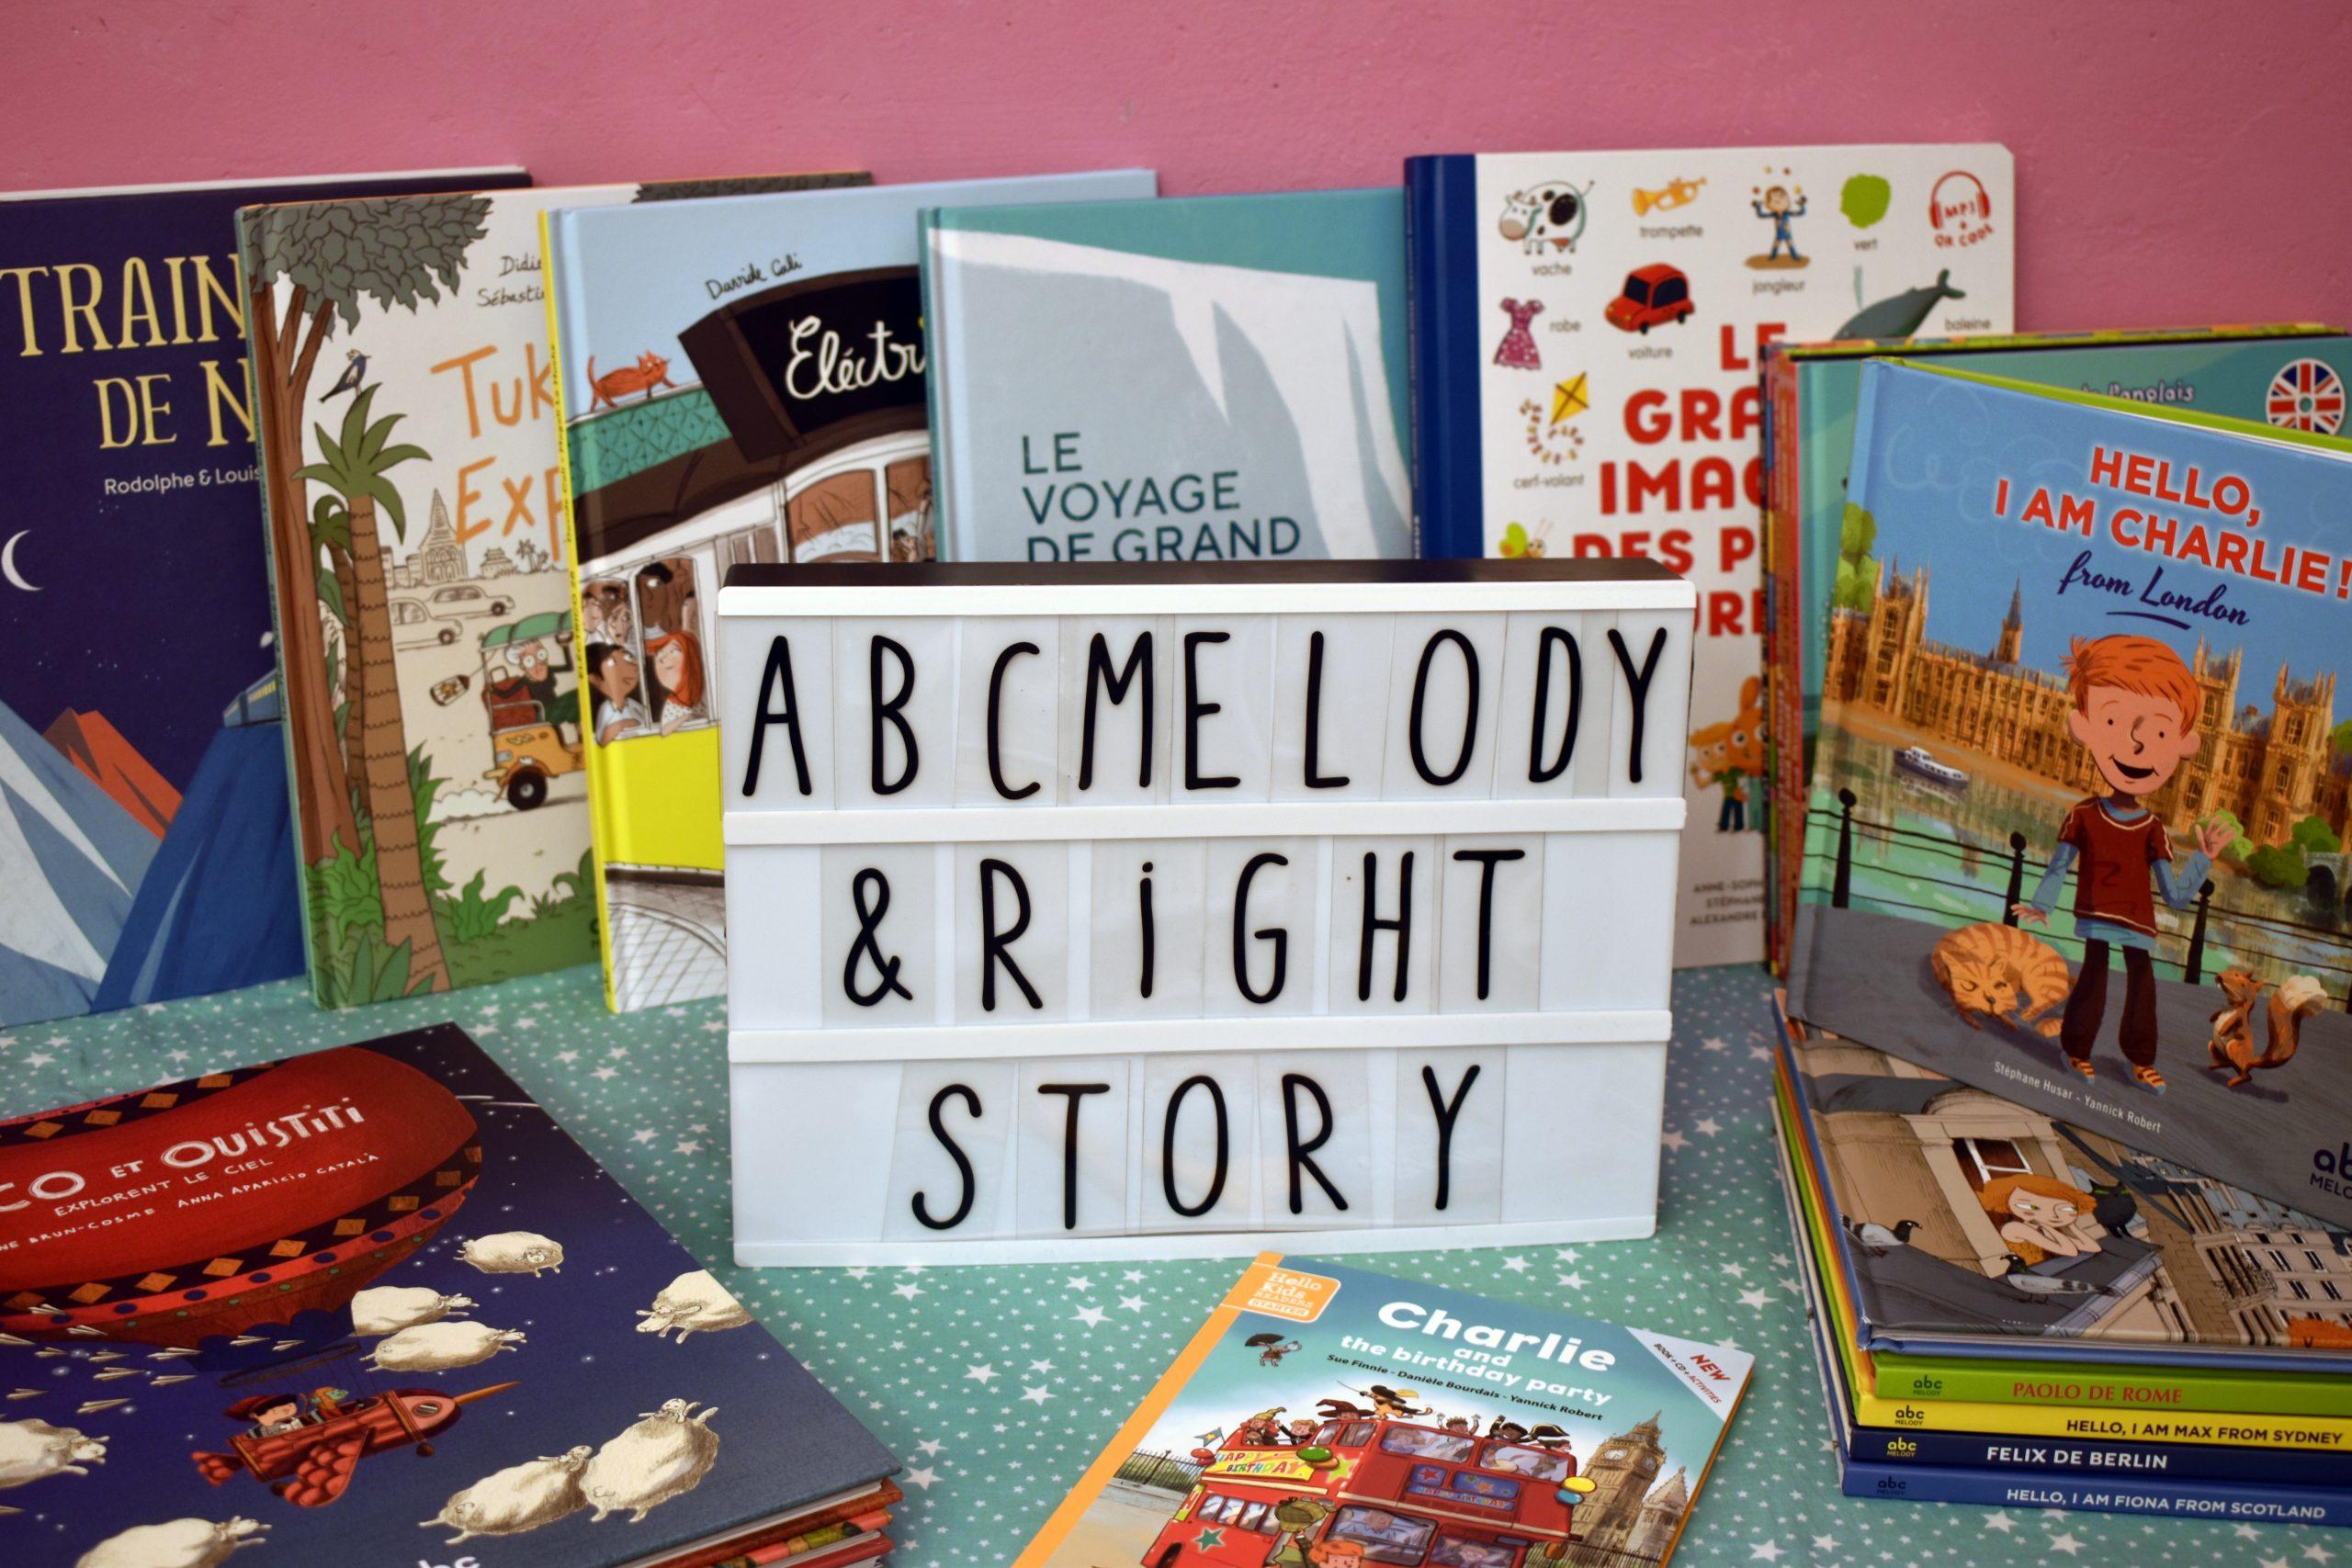 Abc Melody & Right Story